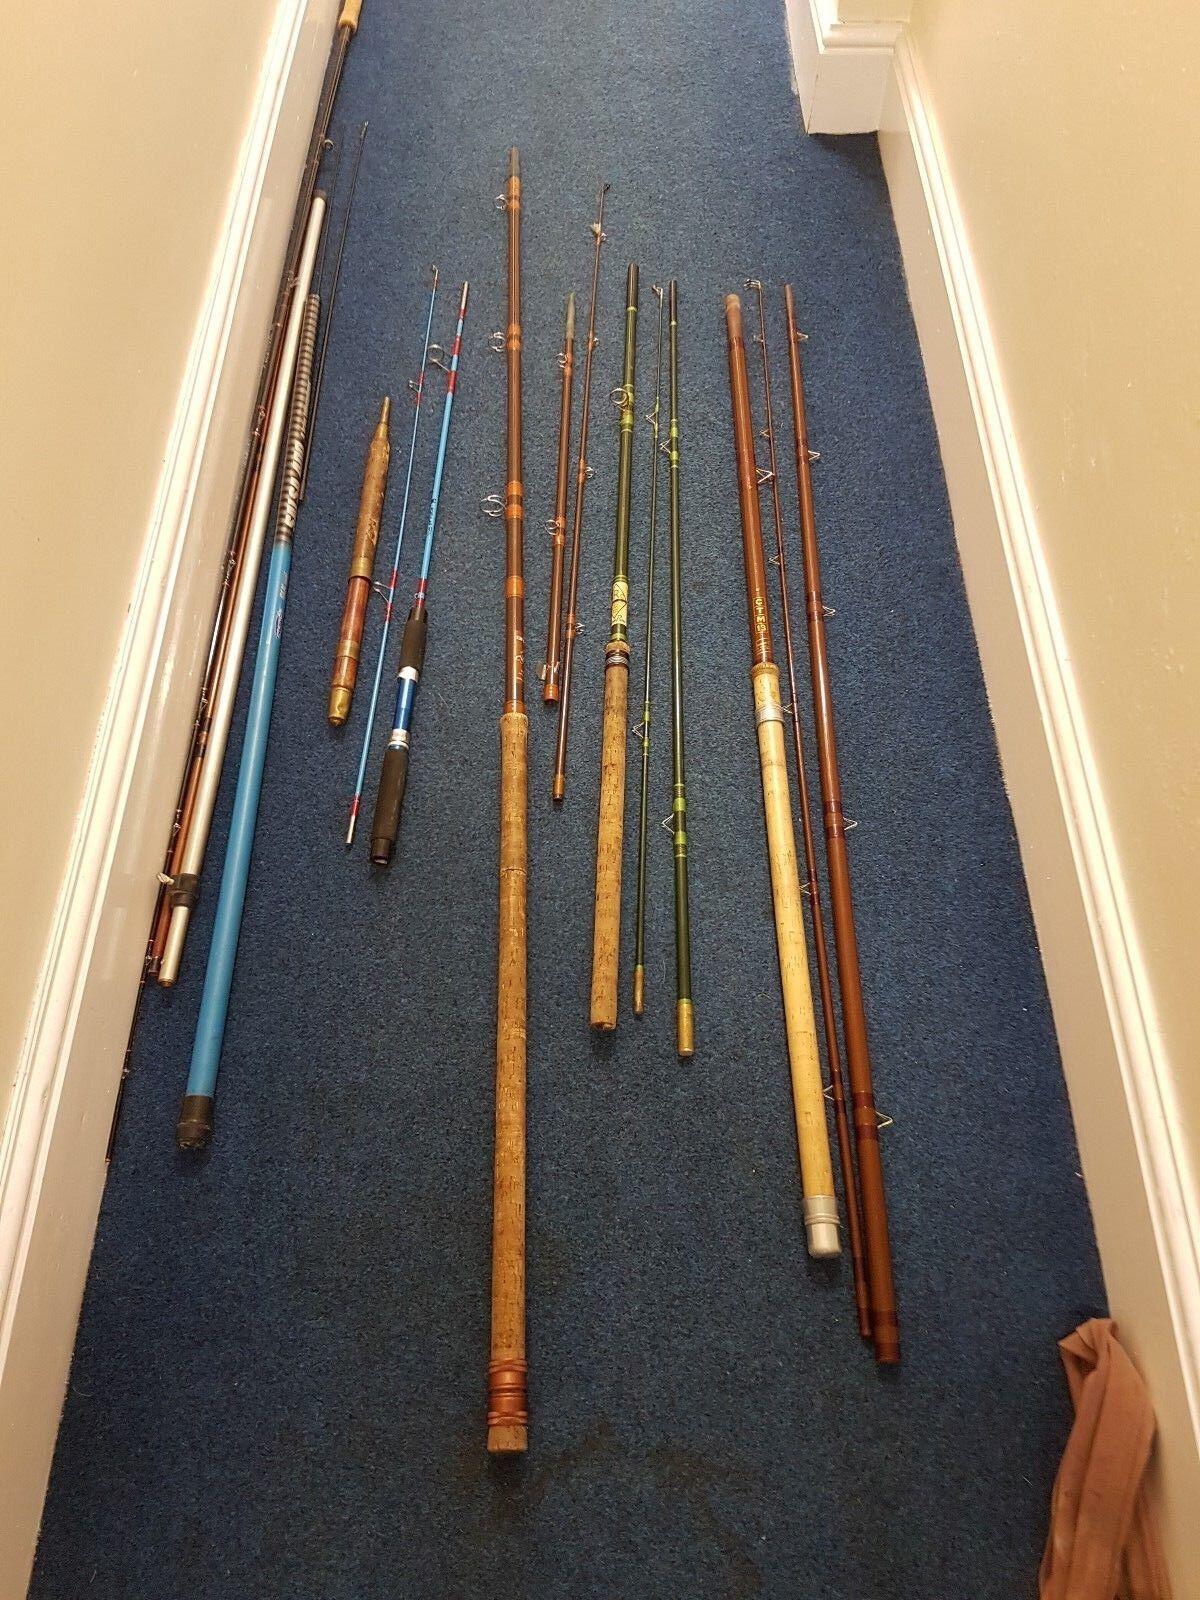 Fishing Rod bundle 6 x Rods Bundle Please Read